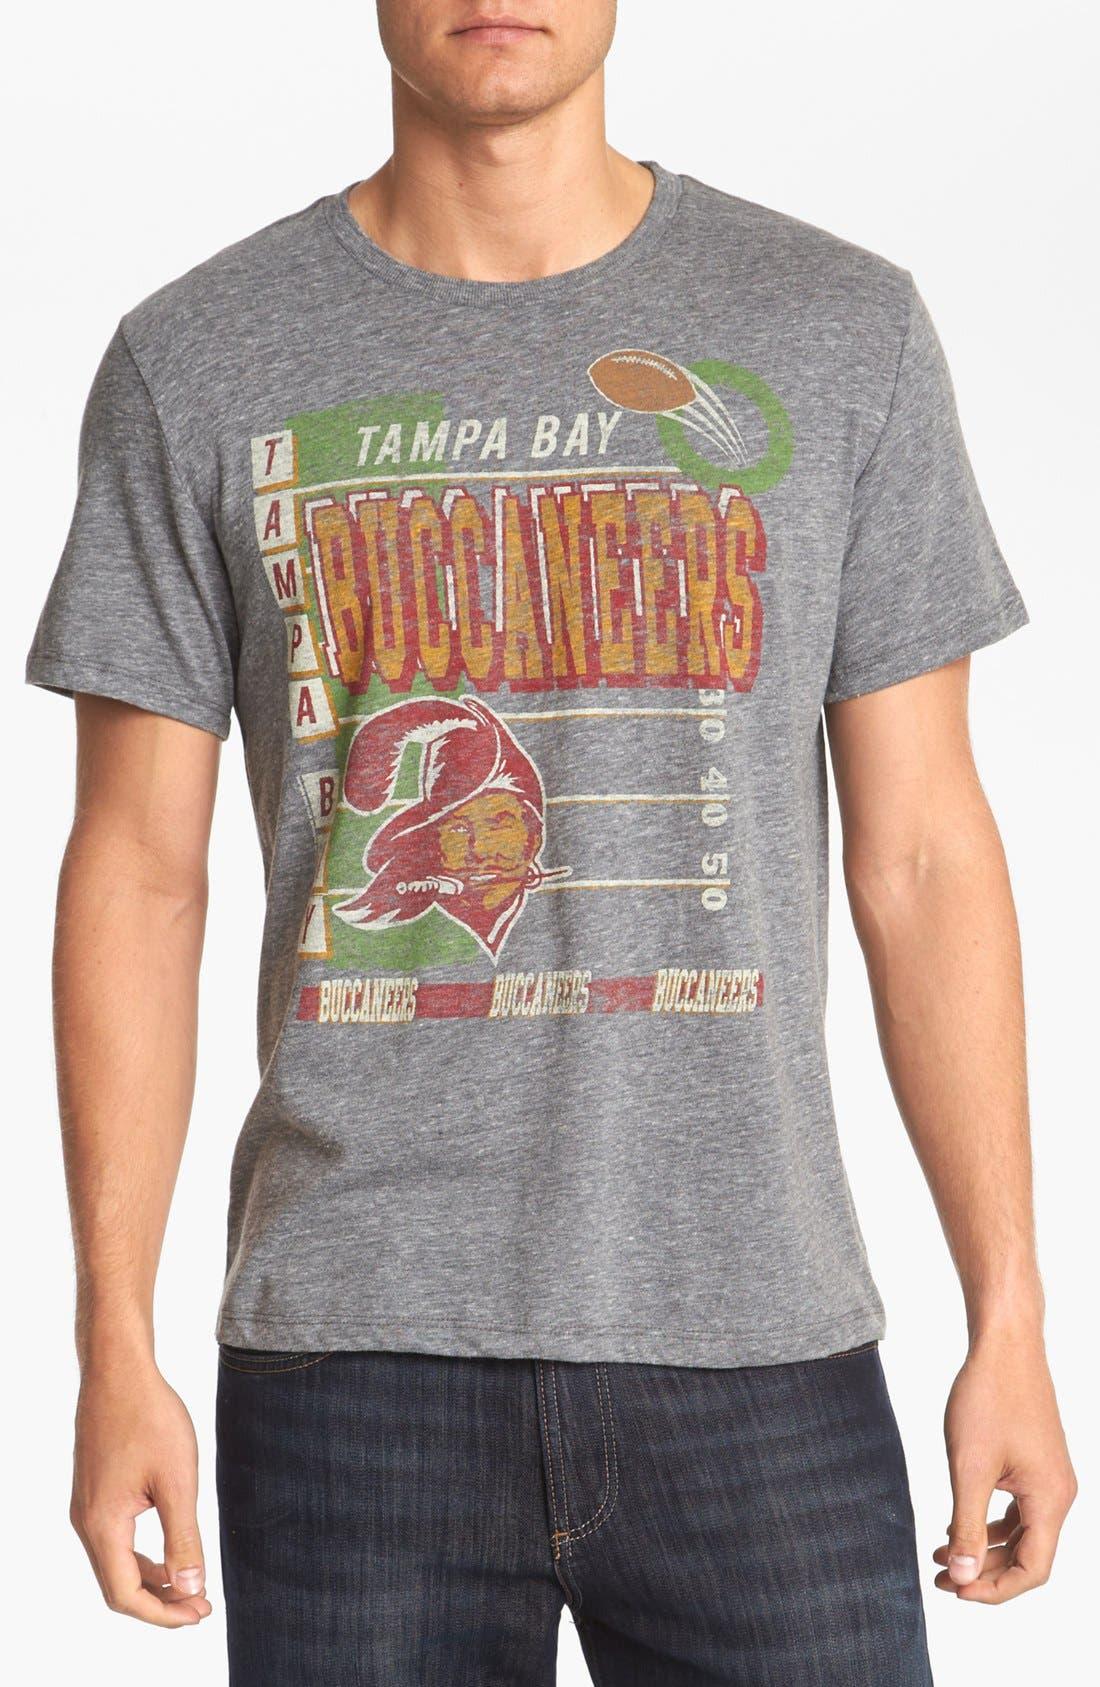 Main Image - Junk Food 'Touchdown - Tampa Bay Buccaneers' T-Shirt